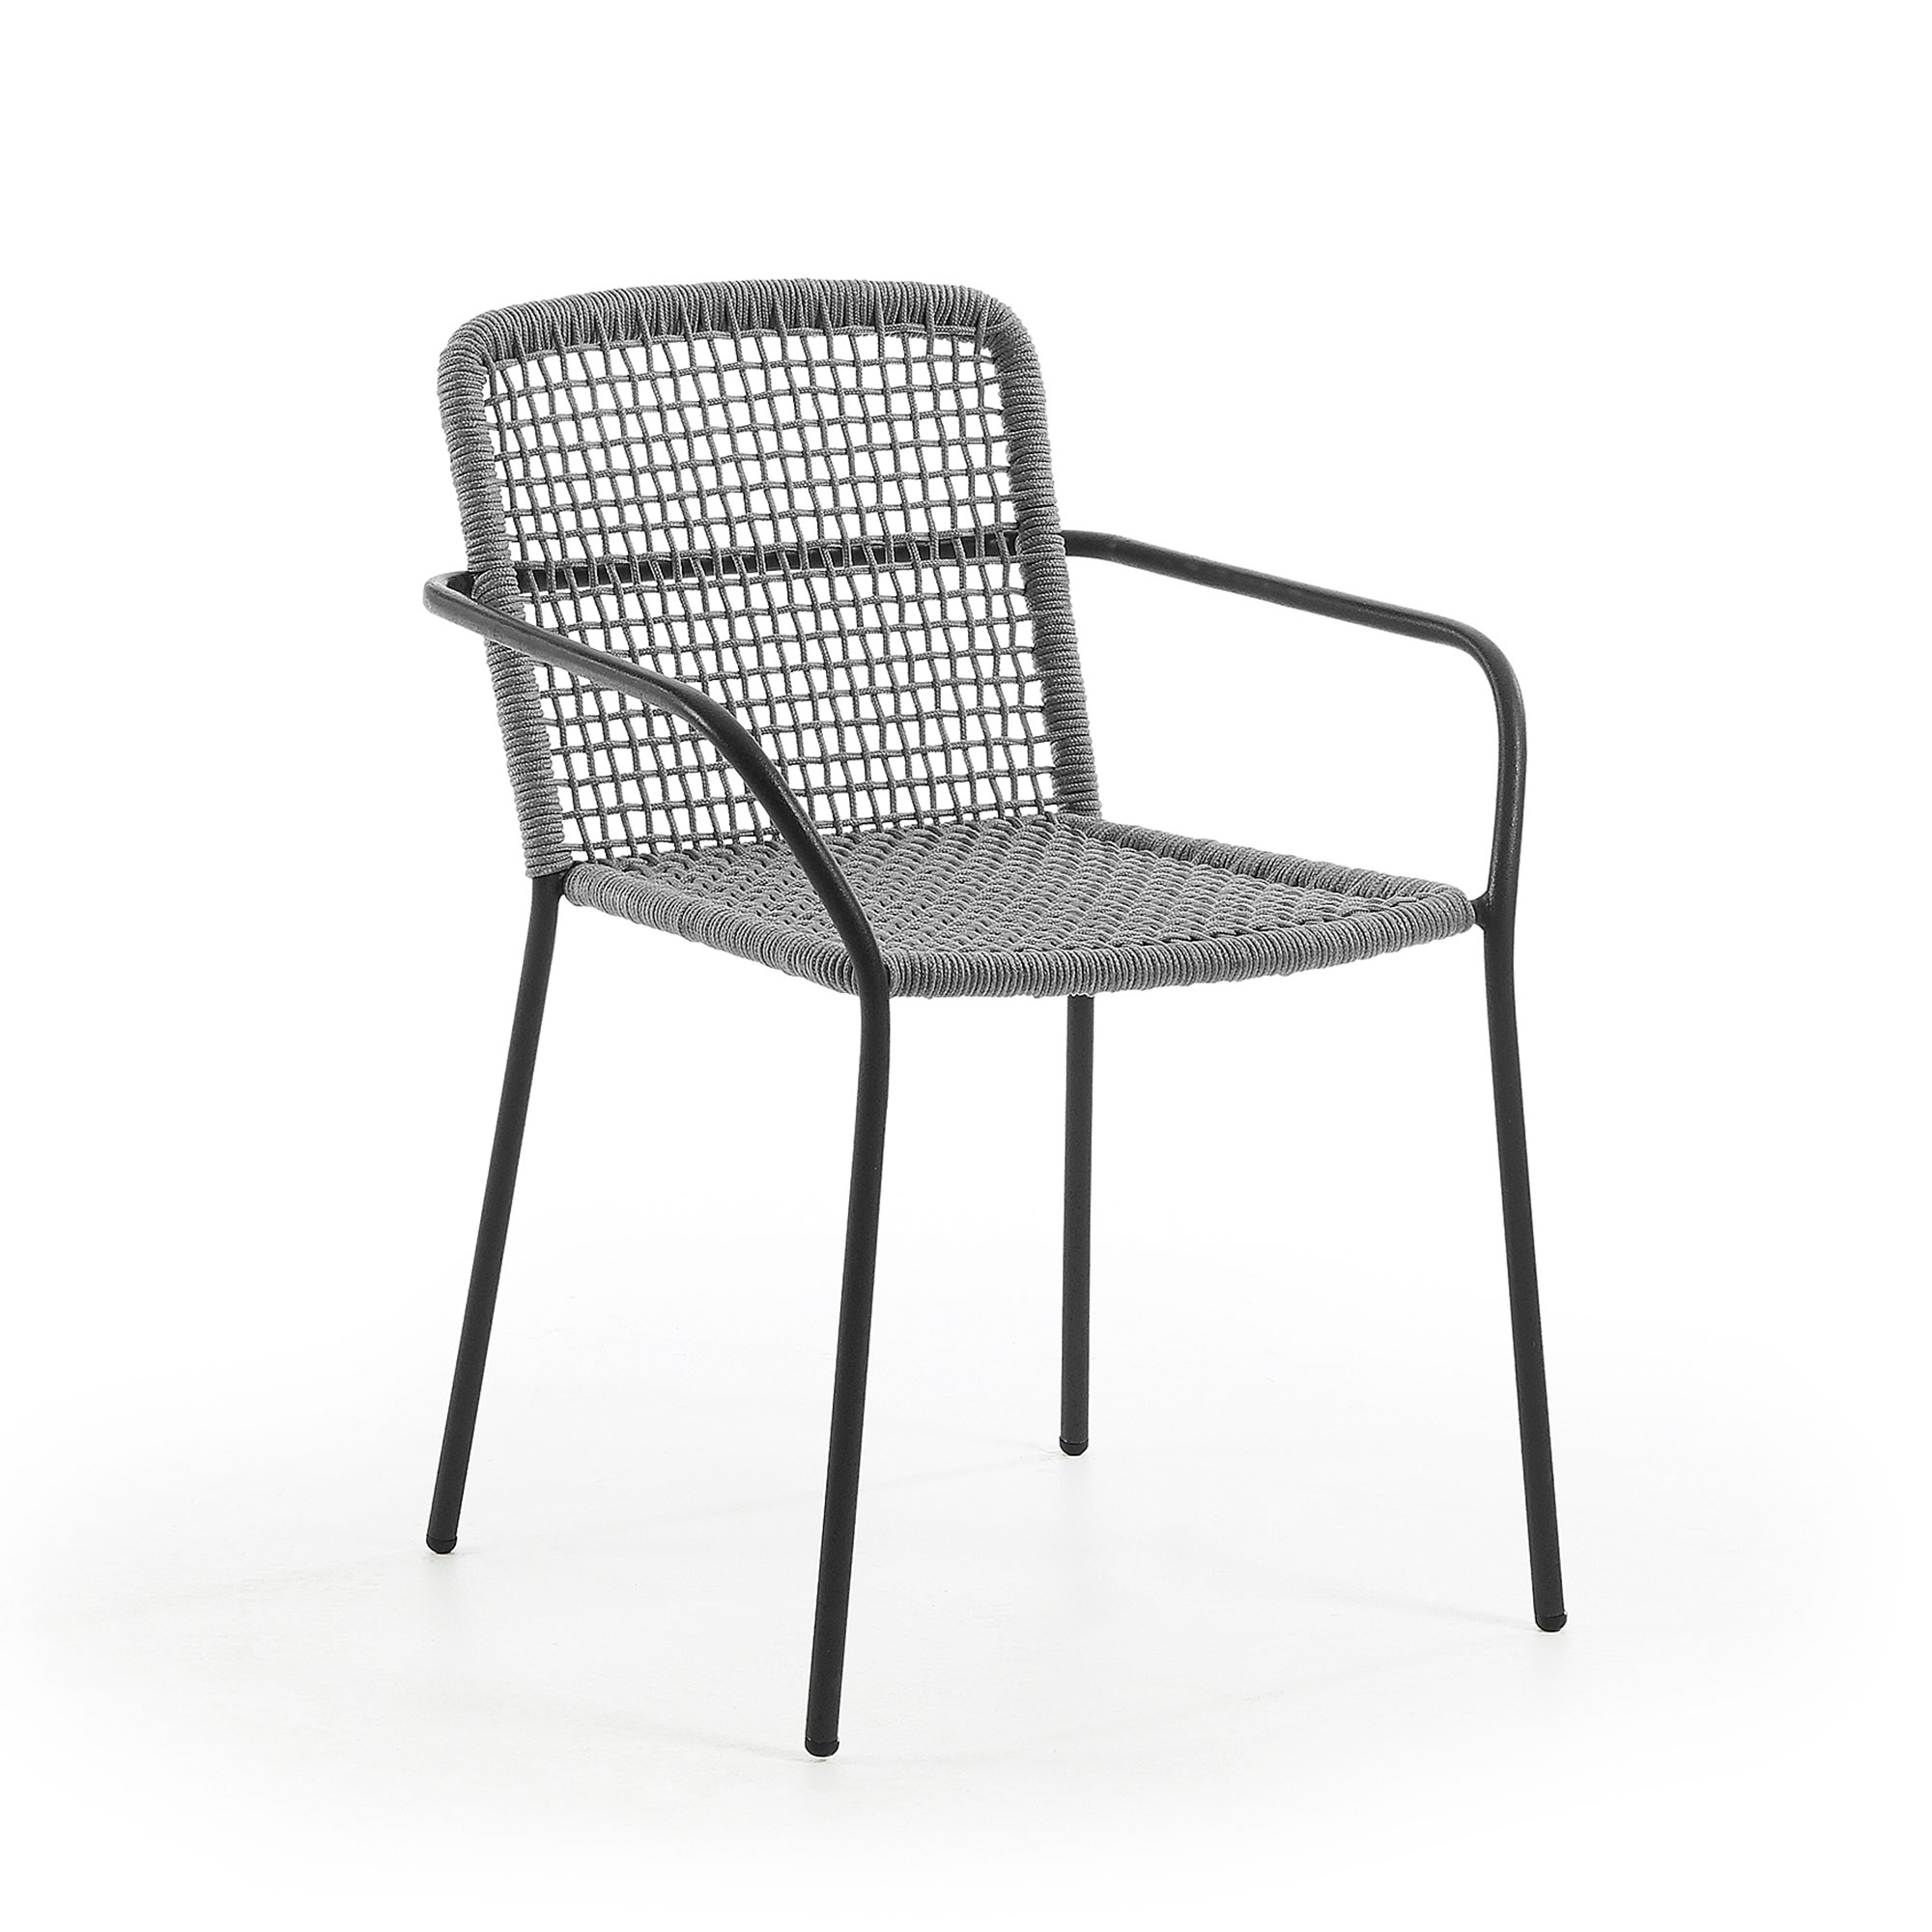 Laforma boomer lænestol - grå polyester/stål, m. armlæn fra laforma fra boboonline.dk